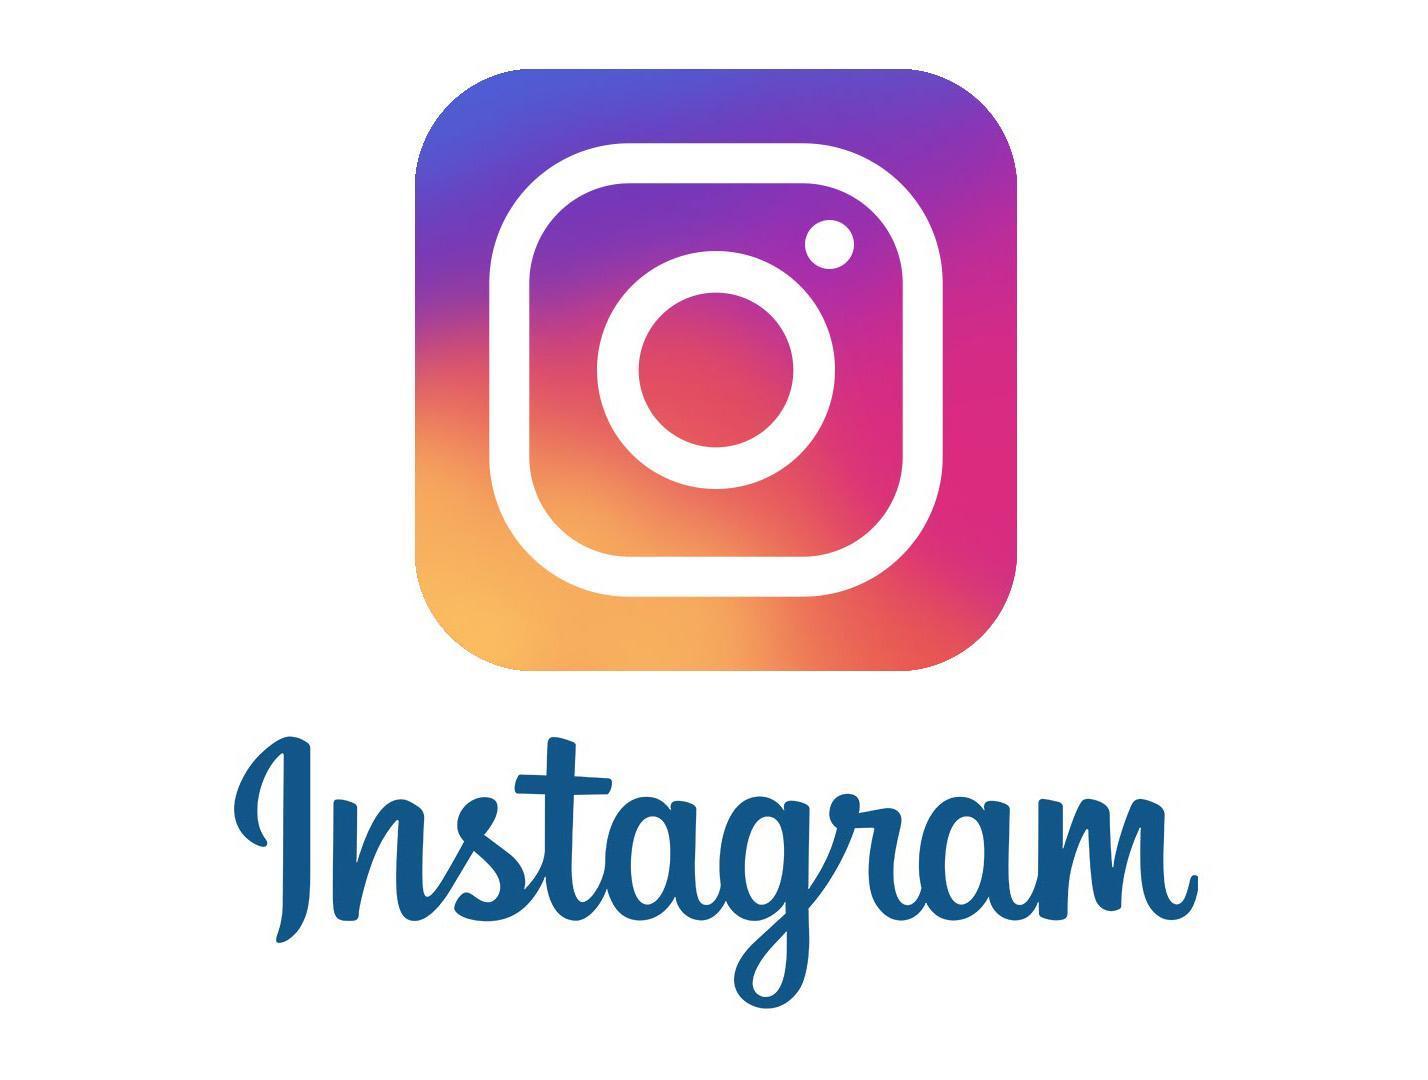 SHH Instagram